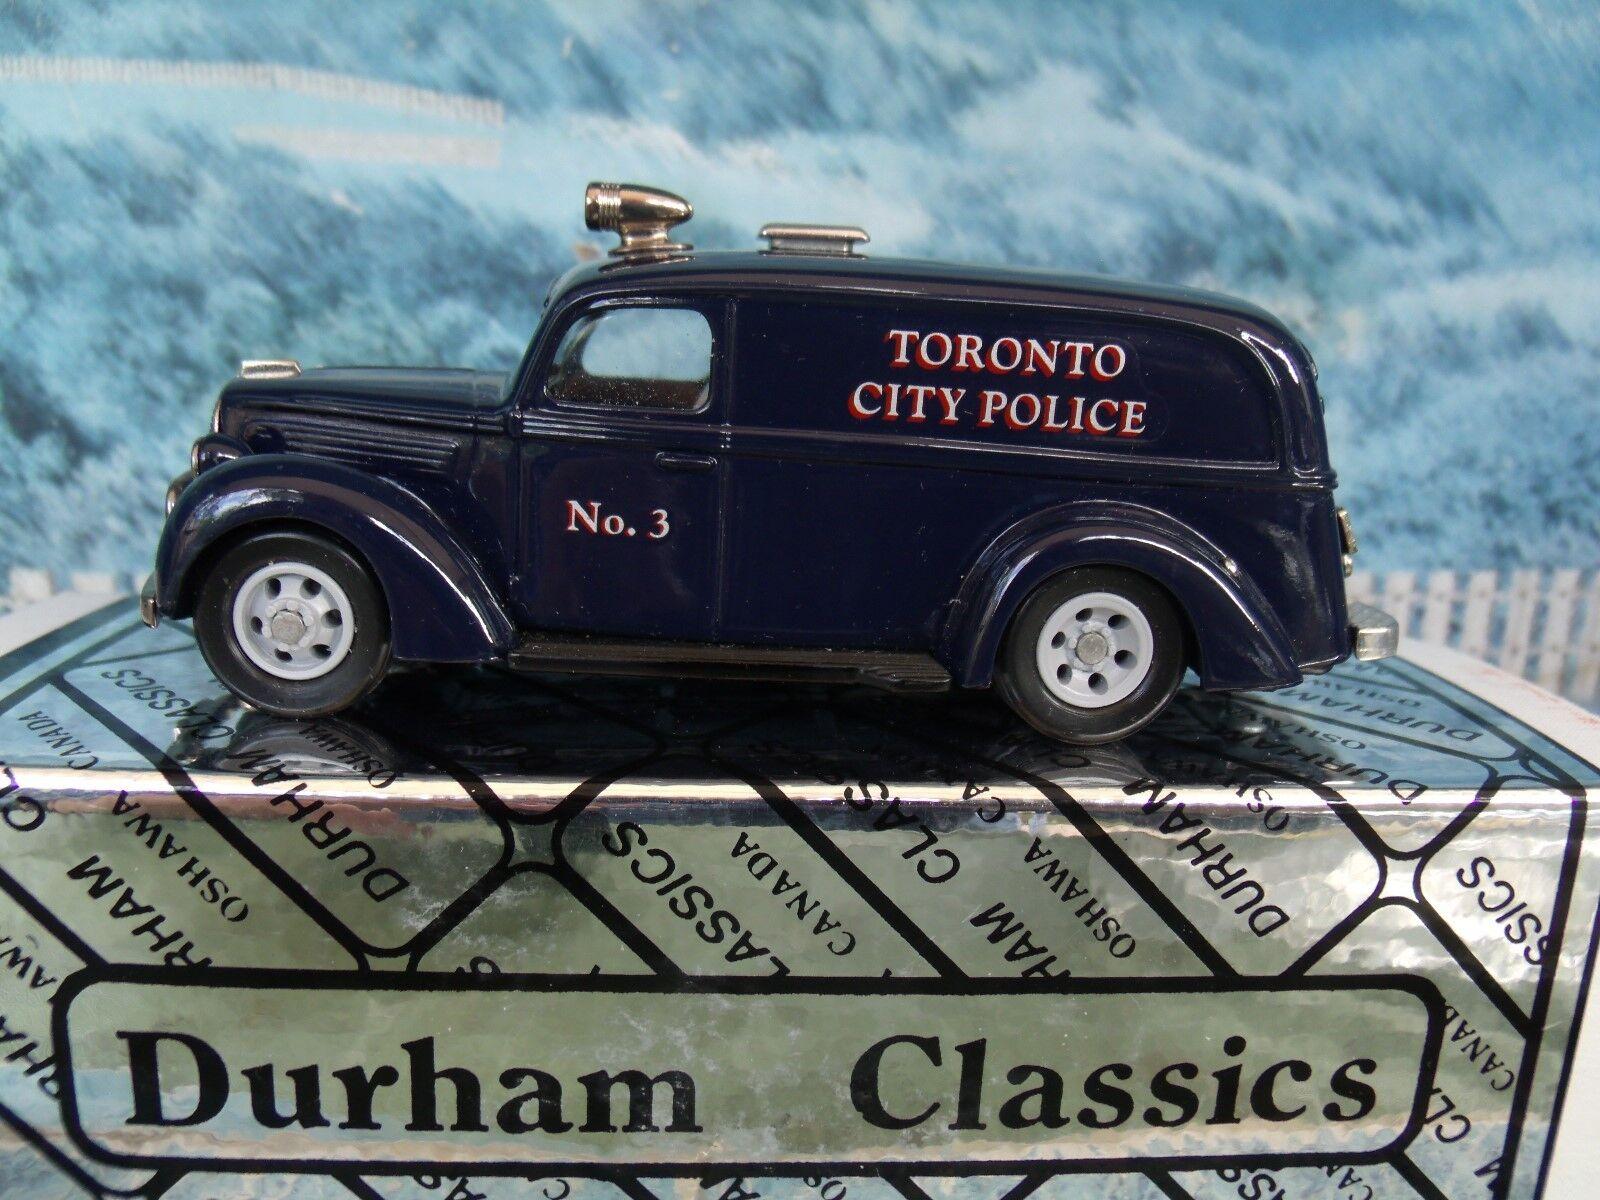 1/43 Durham classics Ford 1939 Paddy wagon Toronto city police 1 of 350